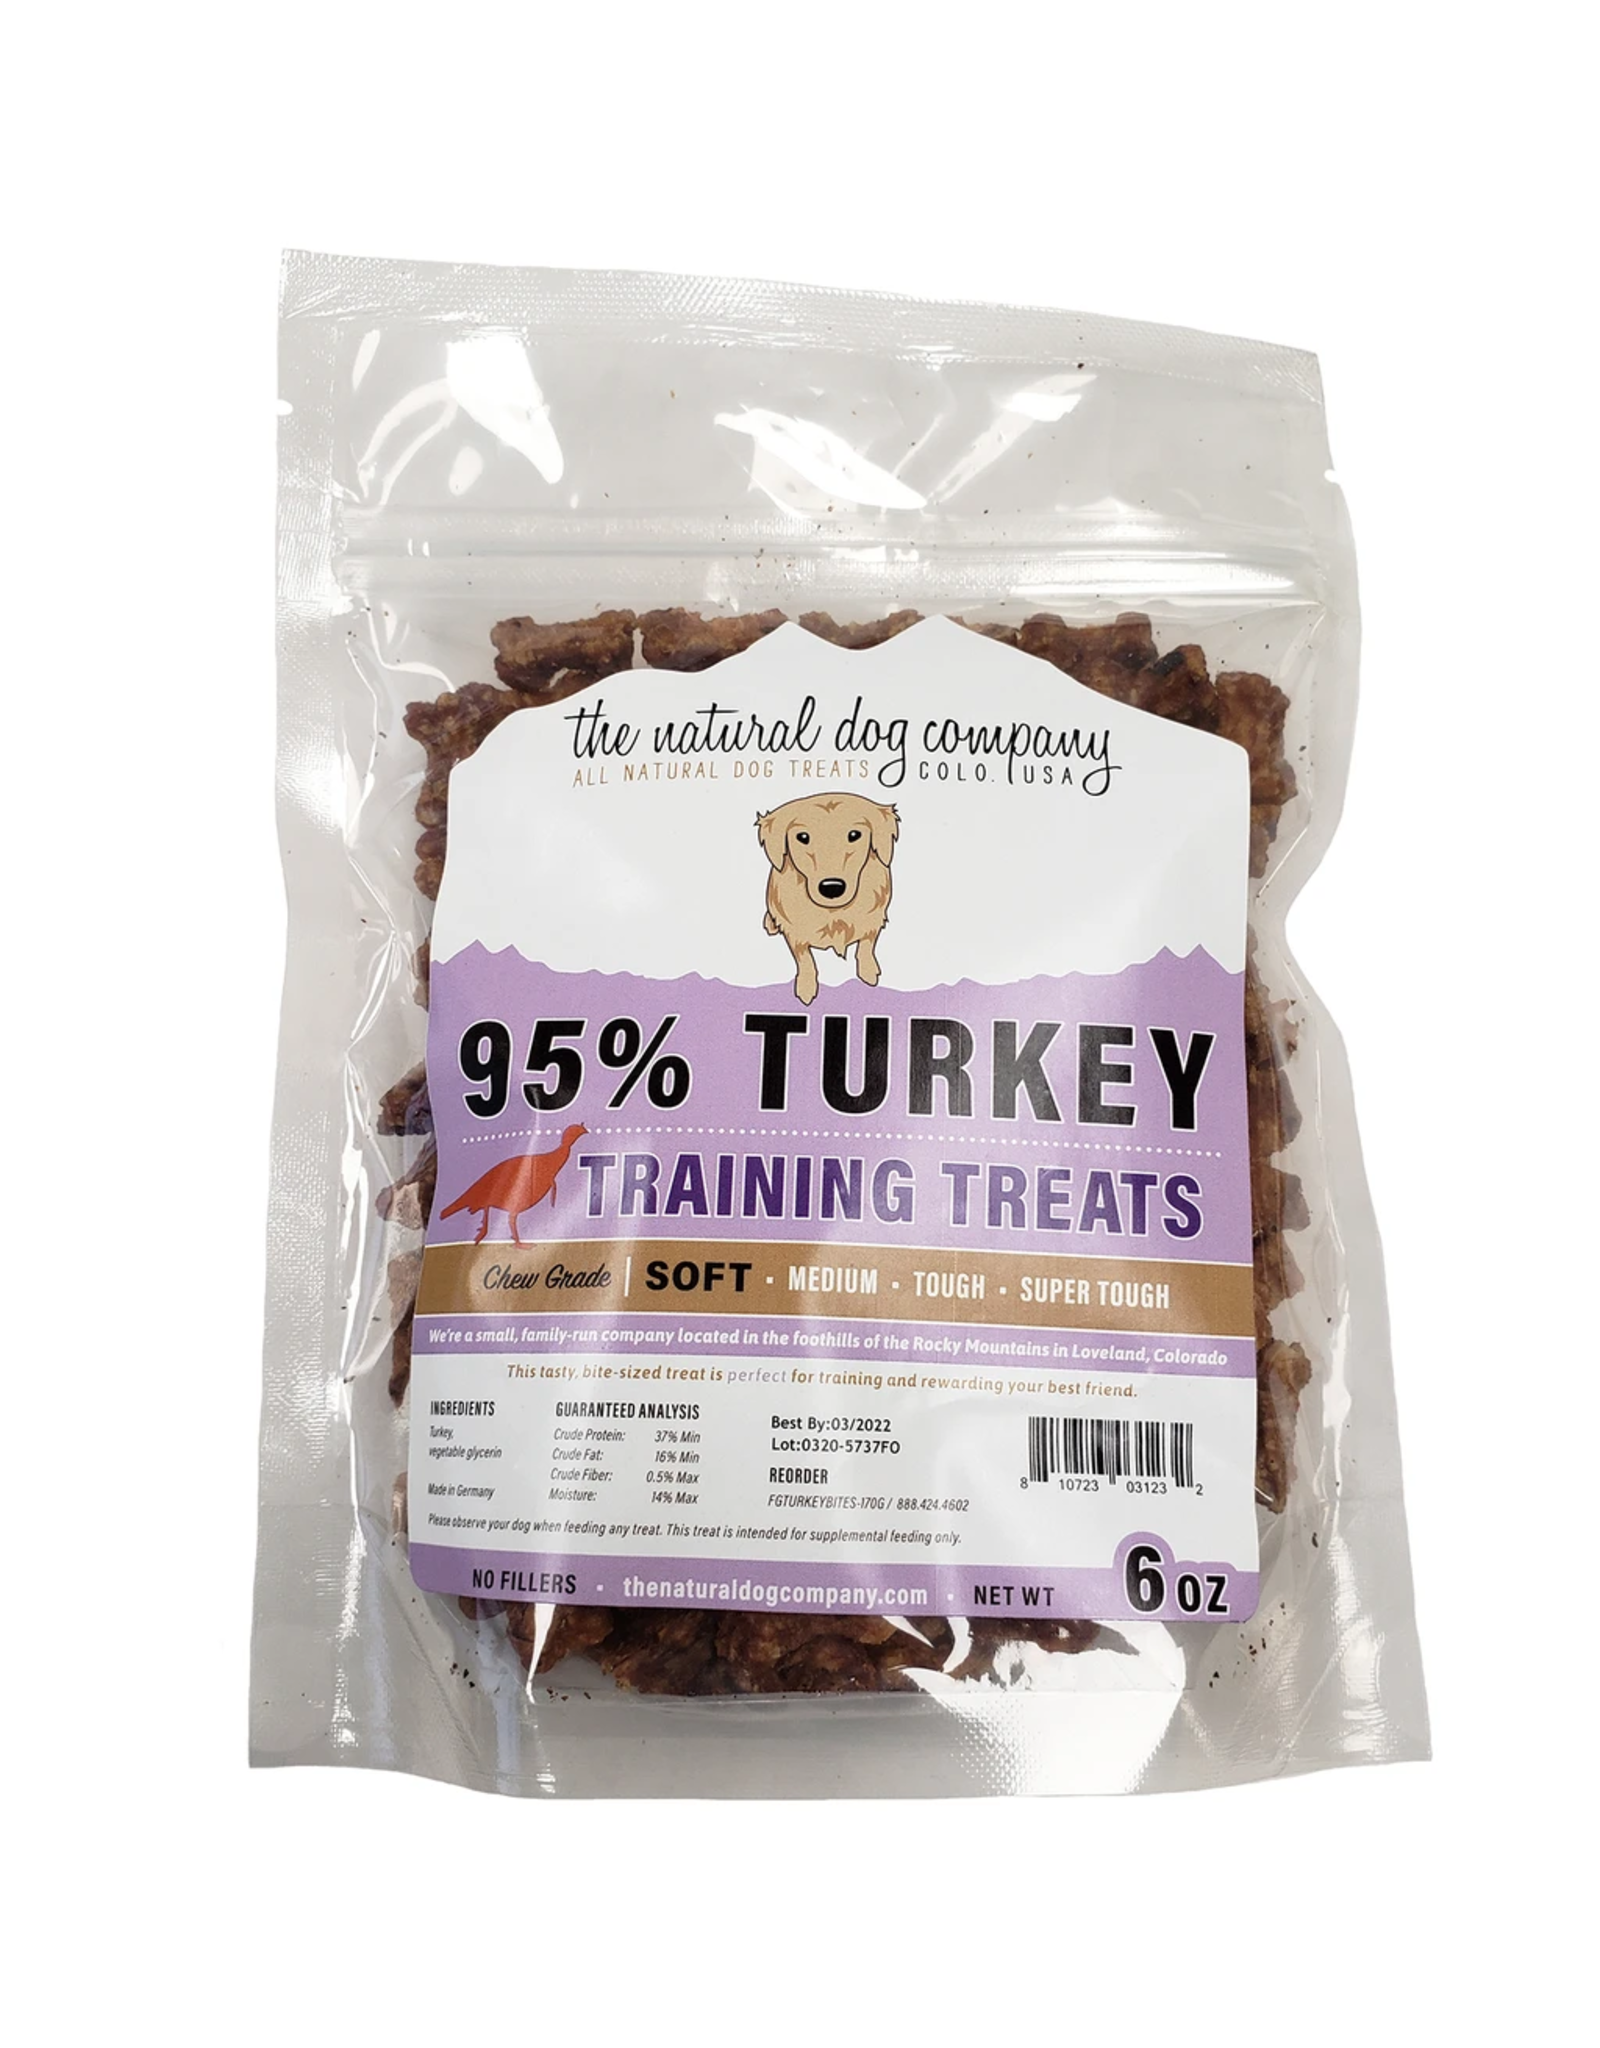 The Natural Dog Company THE NATURAL DOG COMPANY 95% TURKEY TRAINING TREATS 6OZ